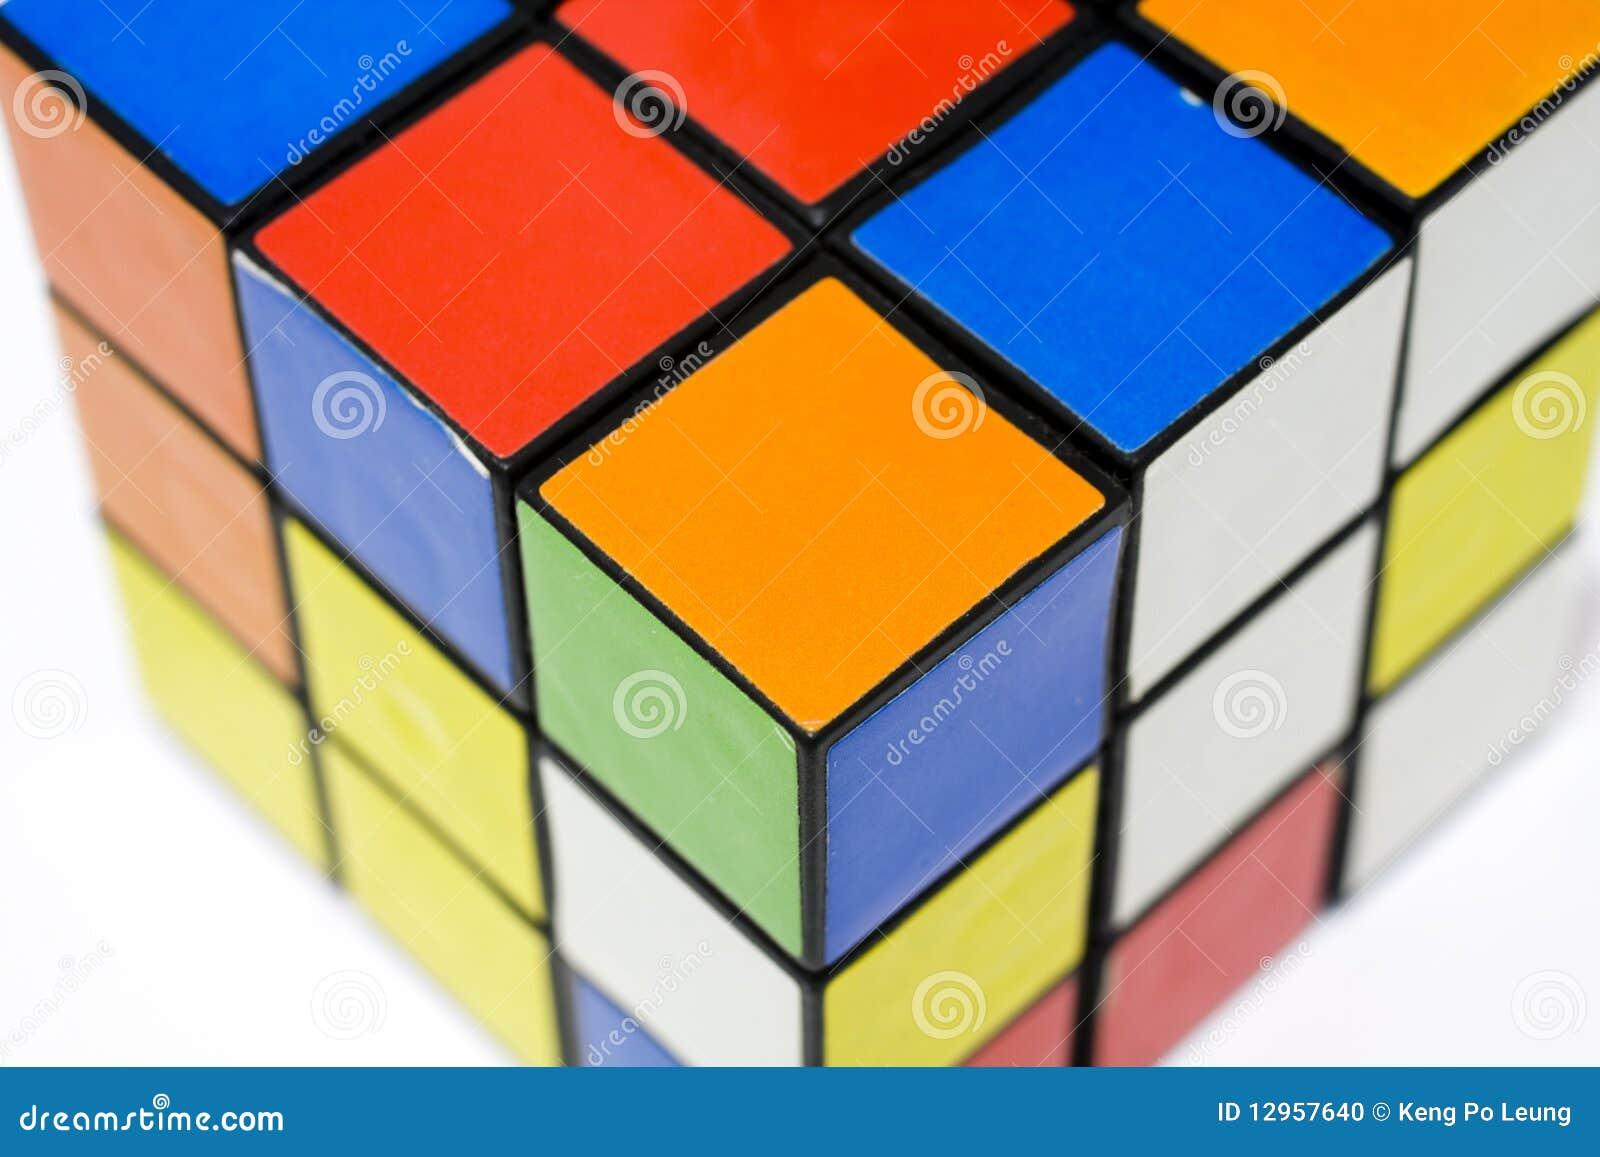 Rubik s cube.